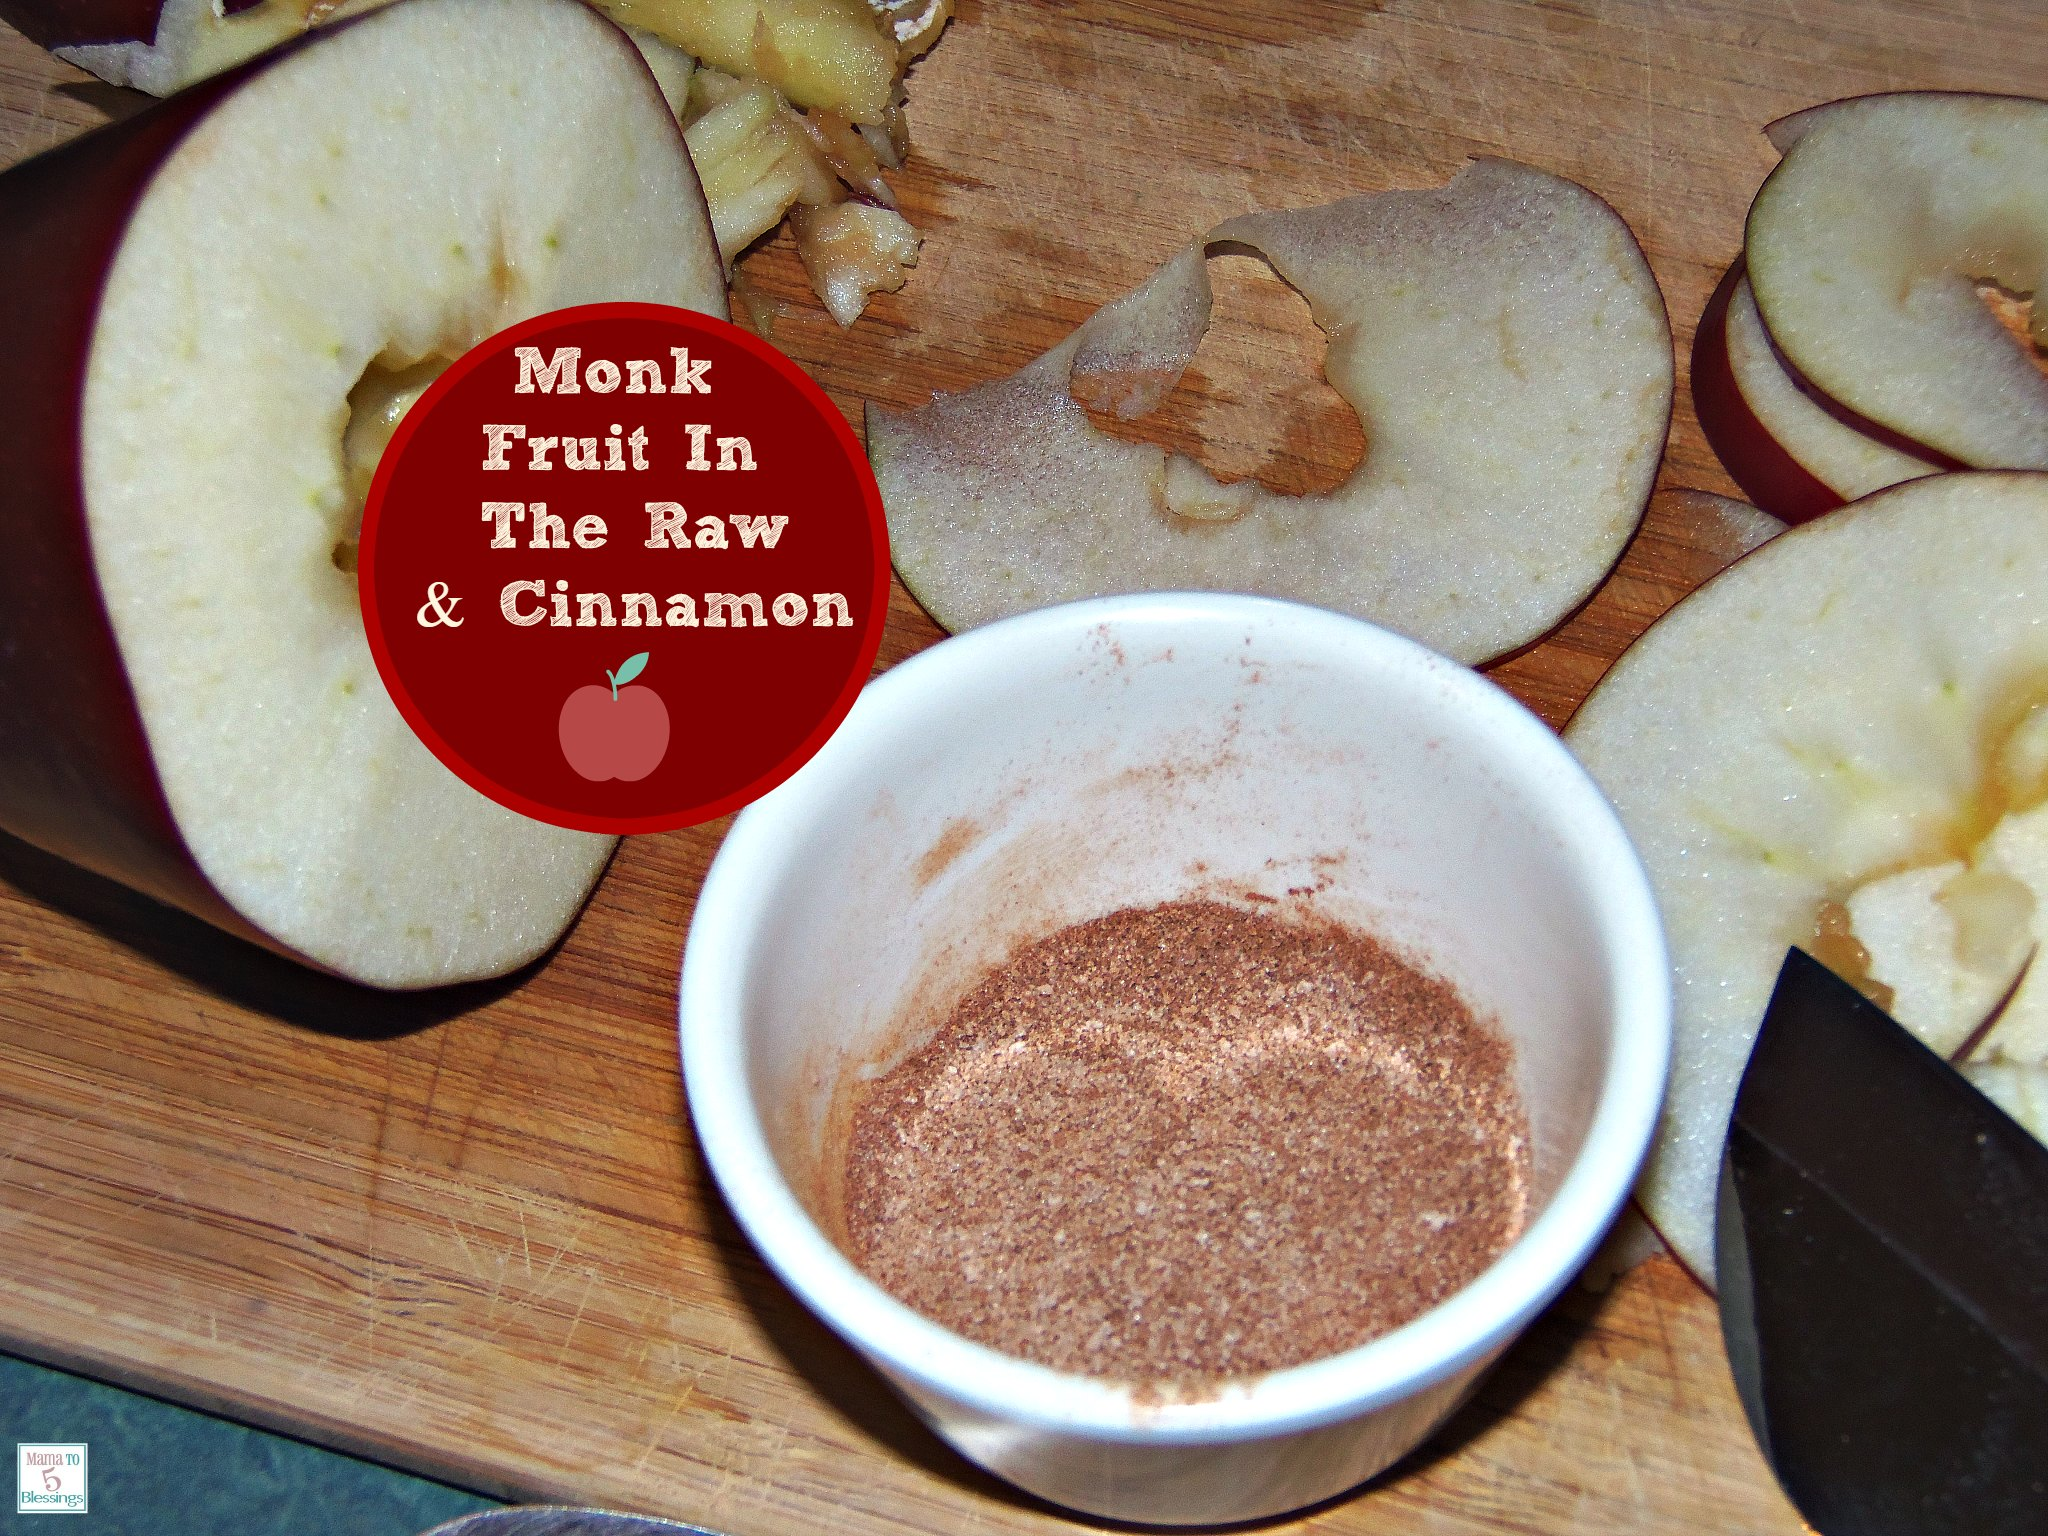 monk fruit with cinnamon